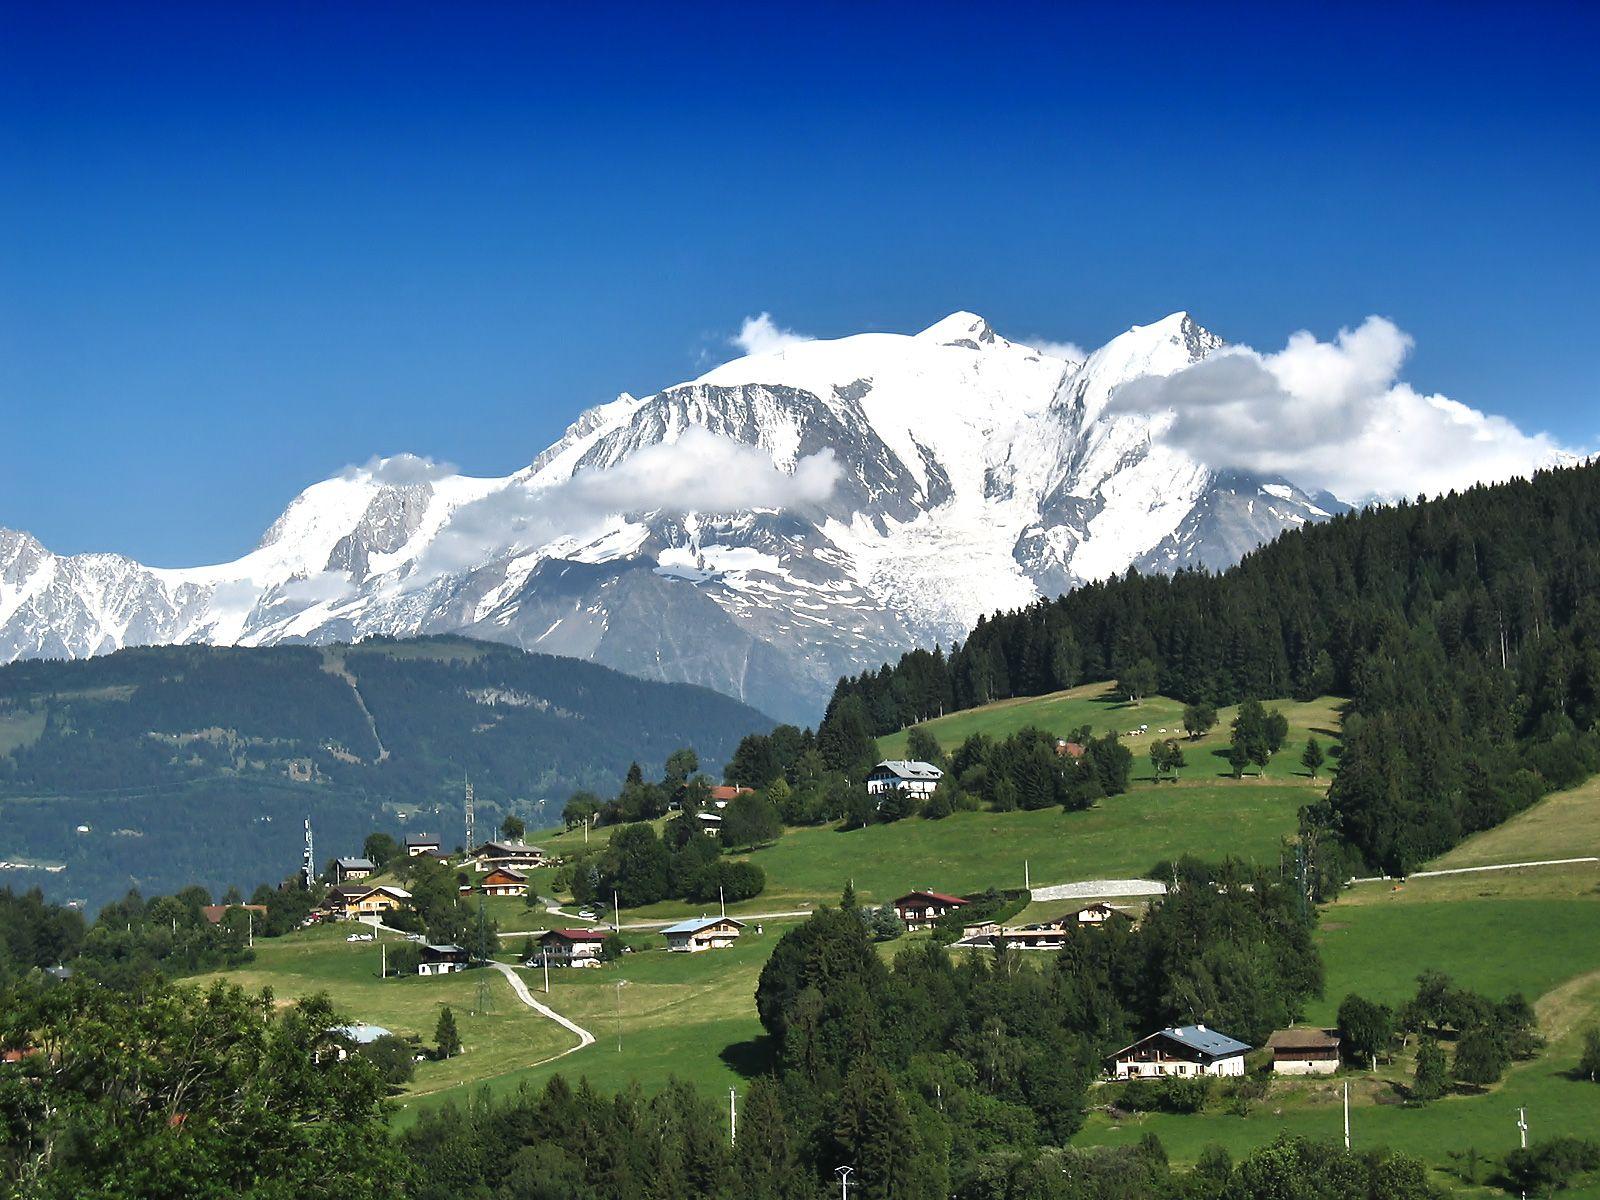 Fond Ecran Paysage Mont Blanc